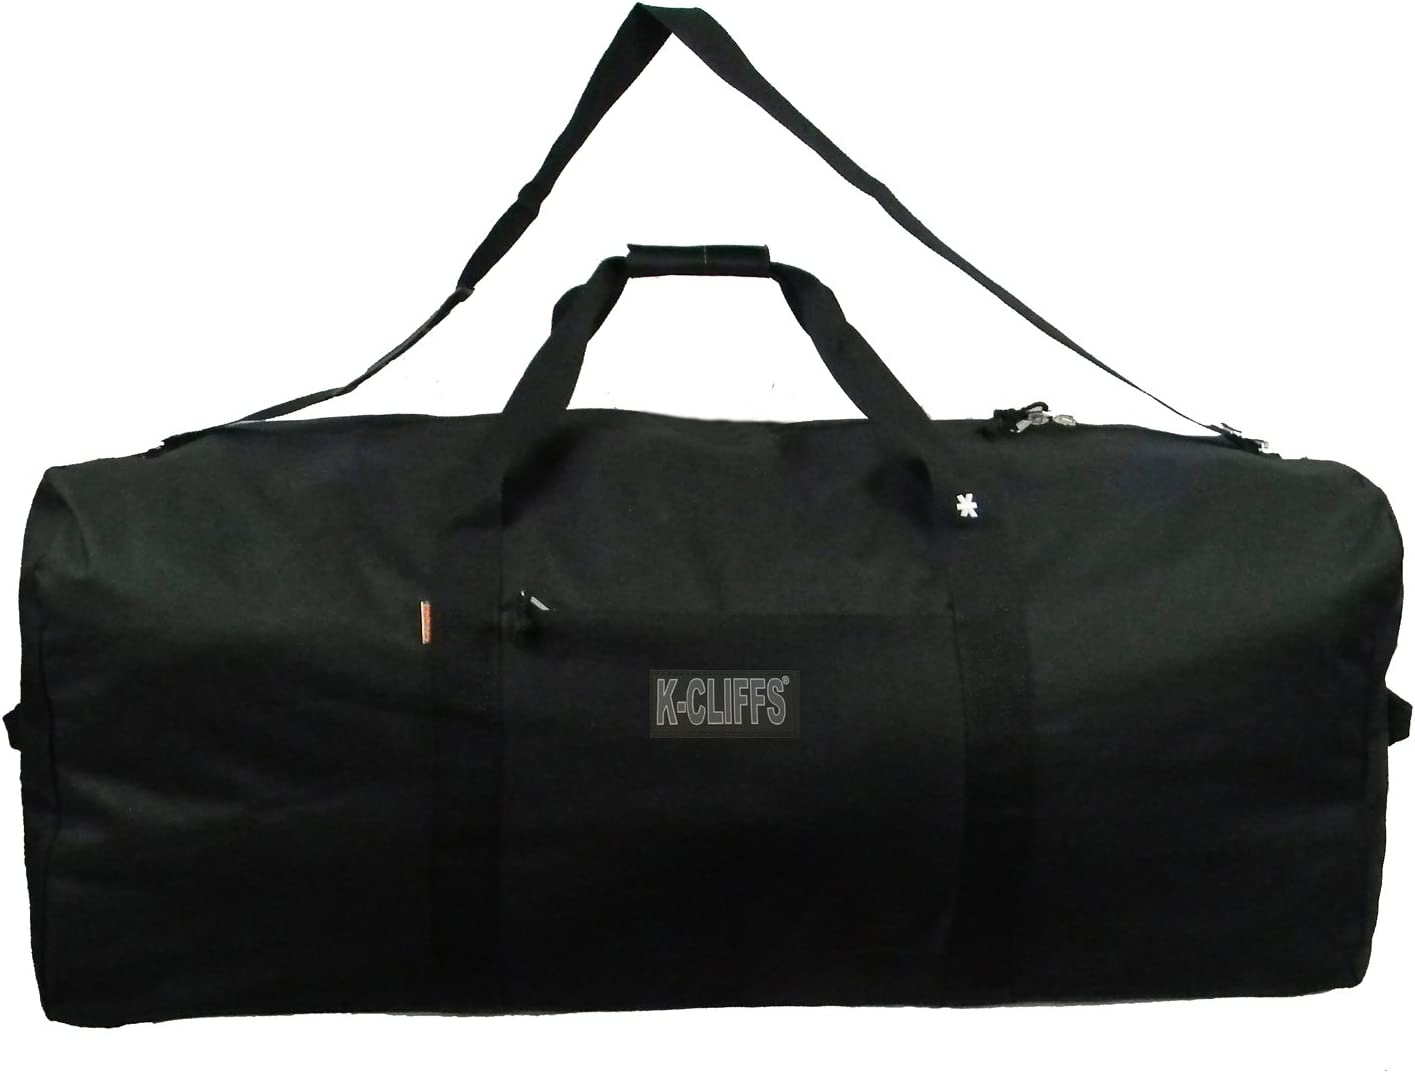 | K-Cliffs Heavy Duty Cargo Duffel Large Sport Gear Equipment Travel Bag Rooftop Rack Bag By Praise Start | Sports Duffels